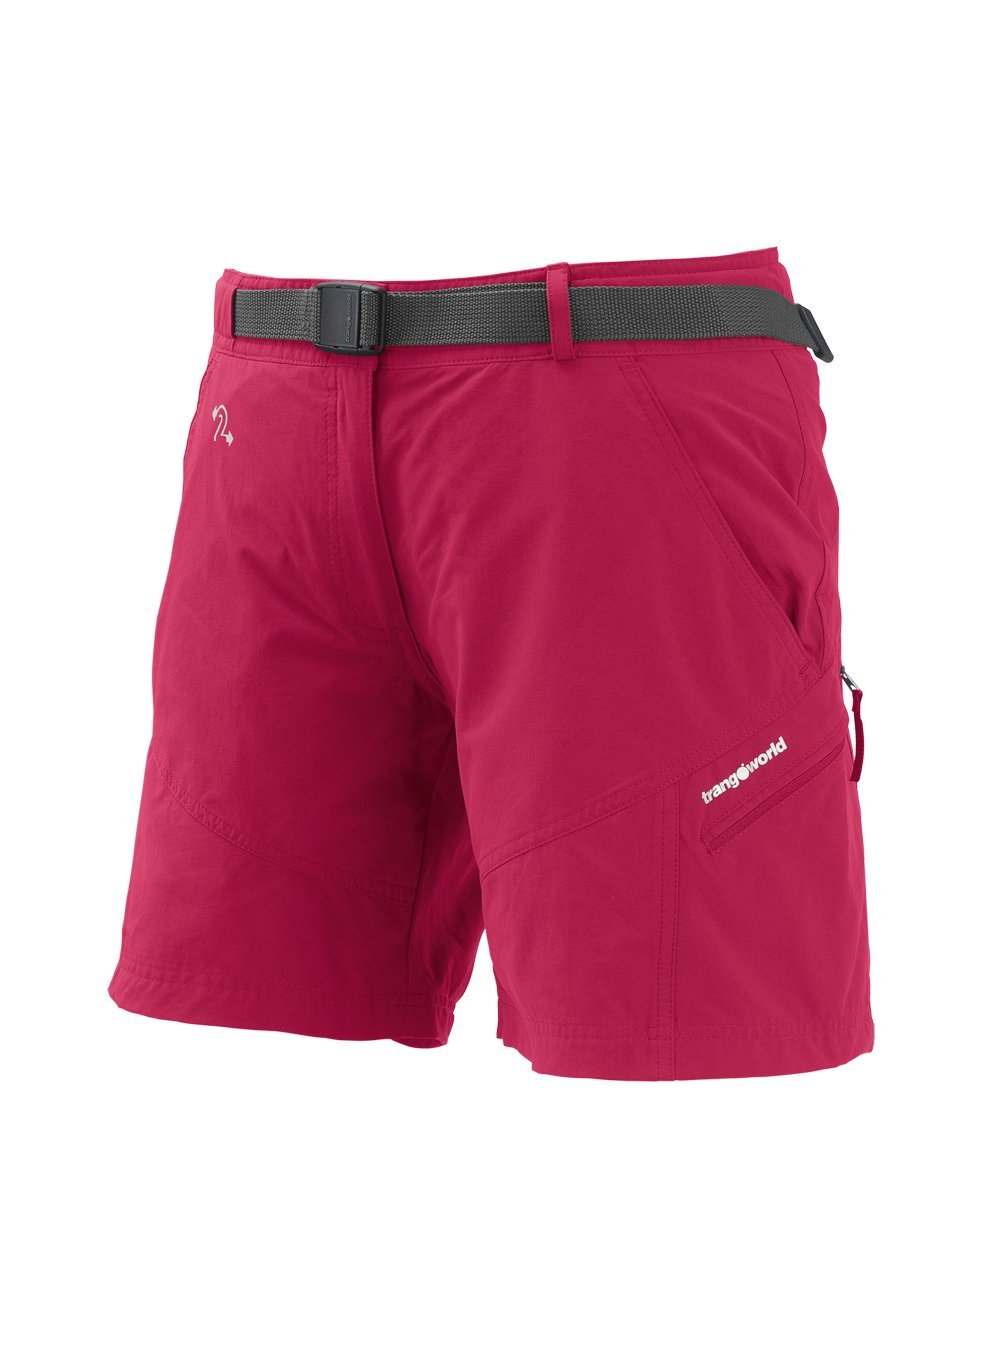 Trango Damen Shorts YITTU, 8433849285505